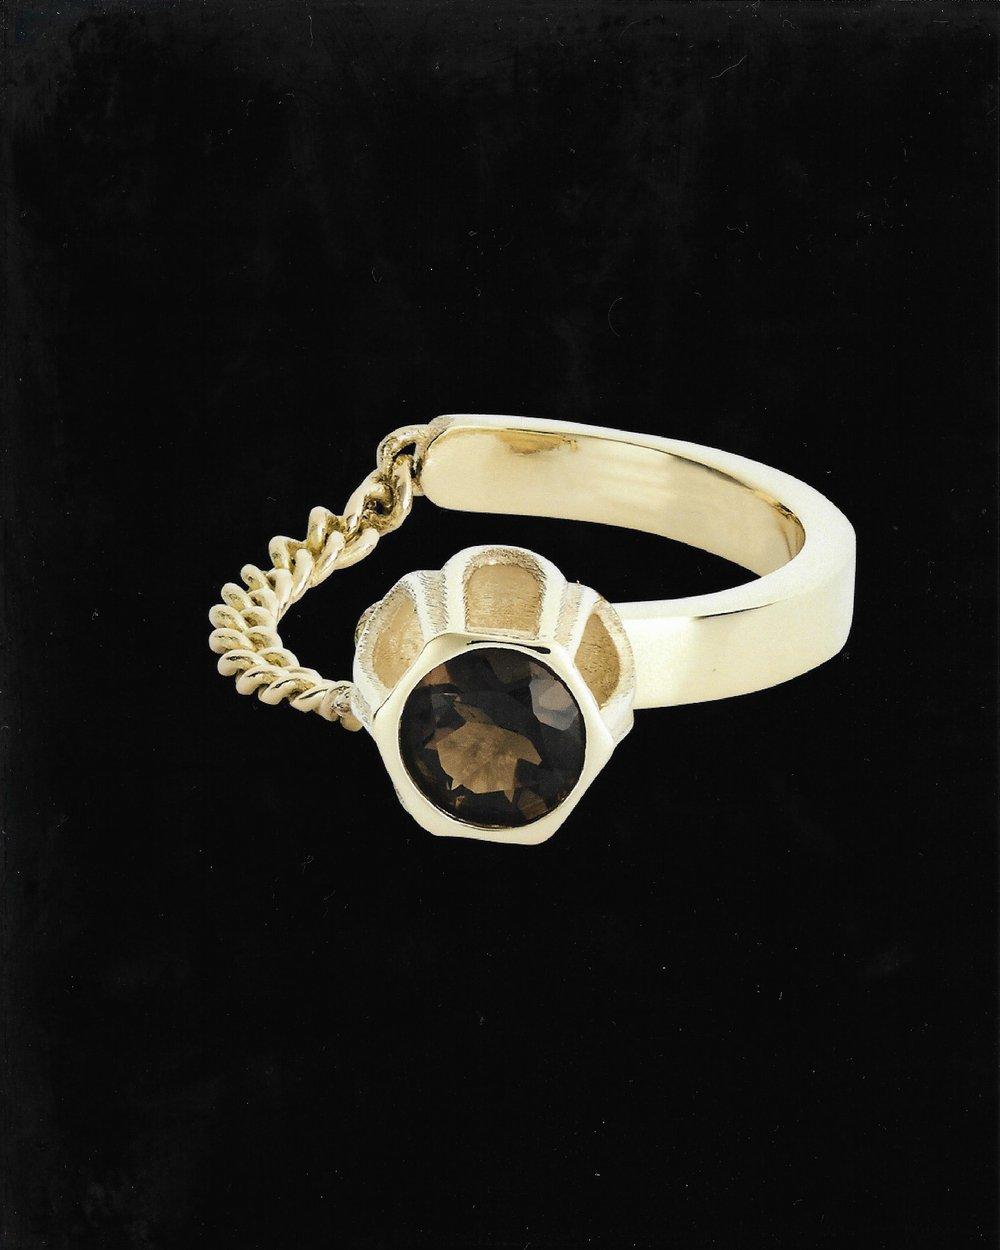 Image of BROWN SMOKEY QUARTZ COBBLE RING